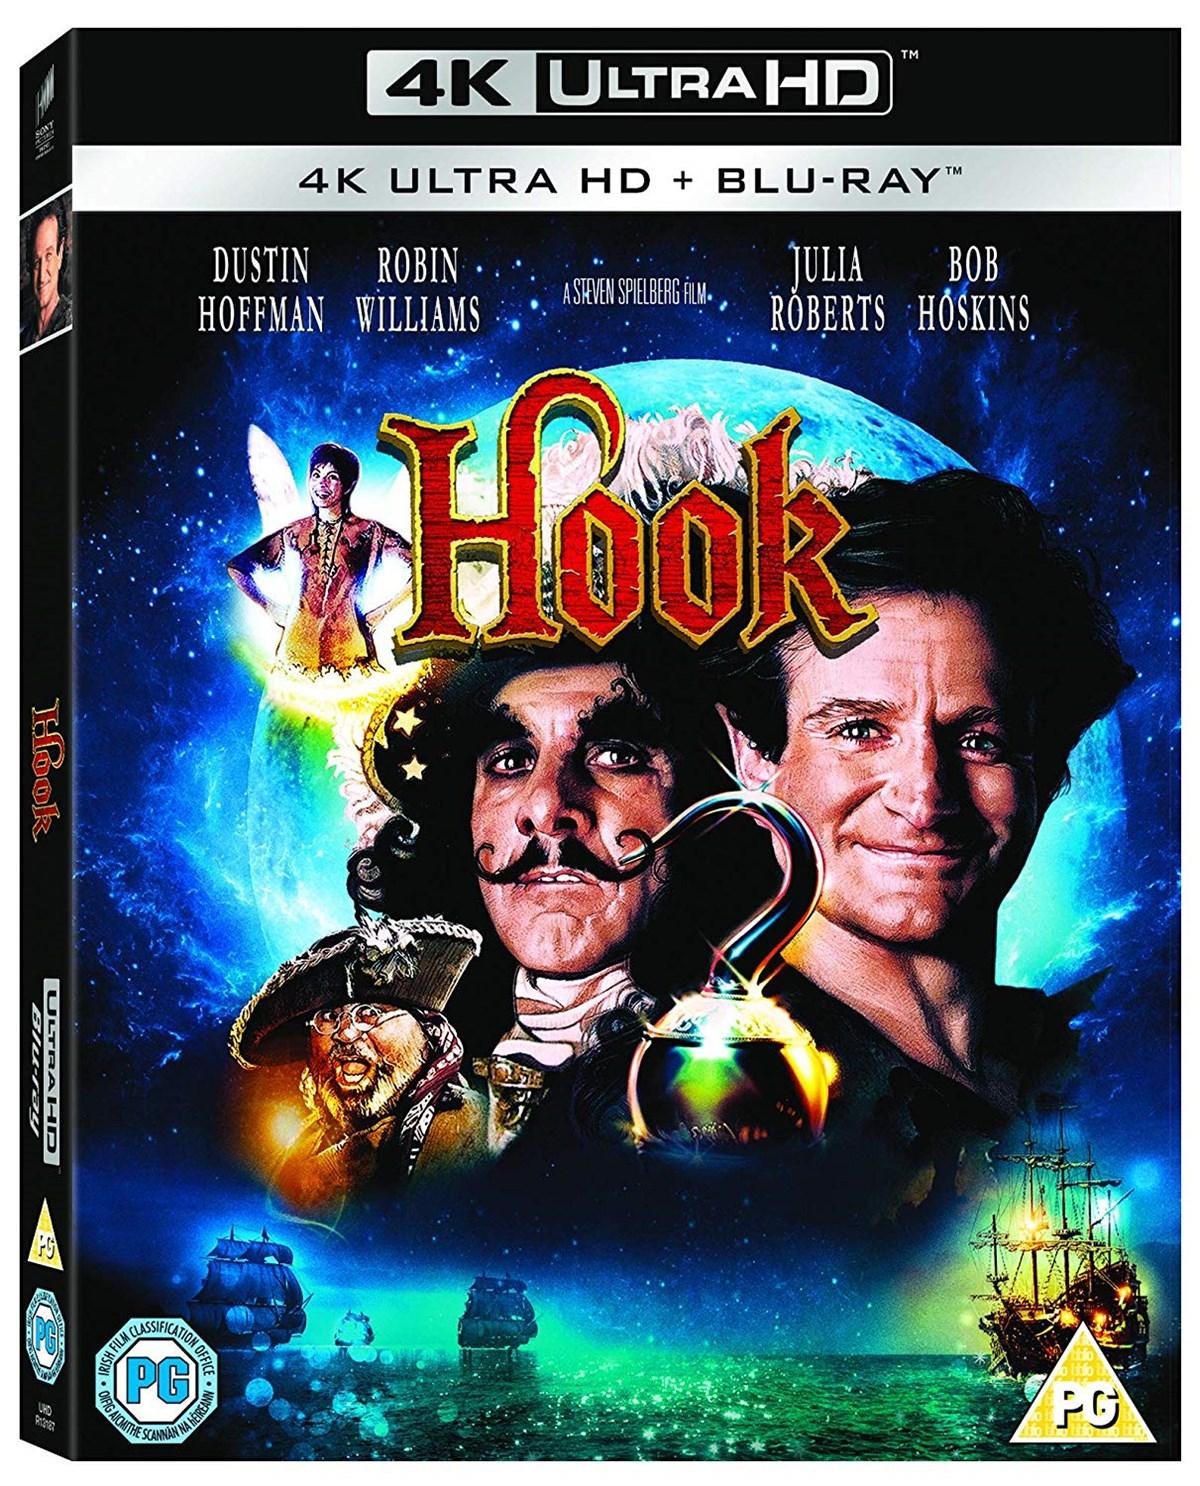 Hook (4K Blu-ray + Blu-ray) für 11,99€ inkl. Versand (Zoom UK)